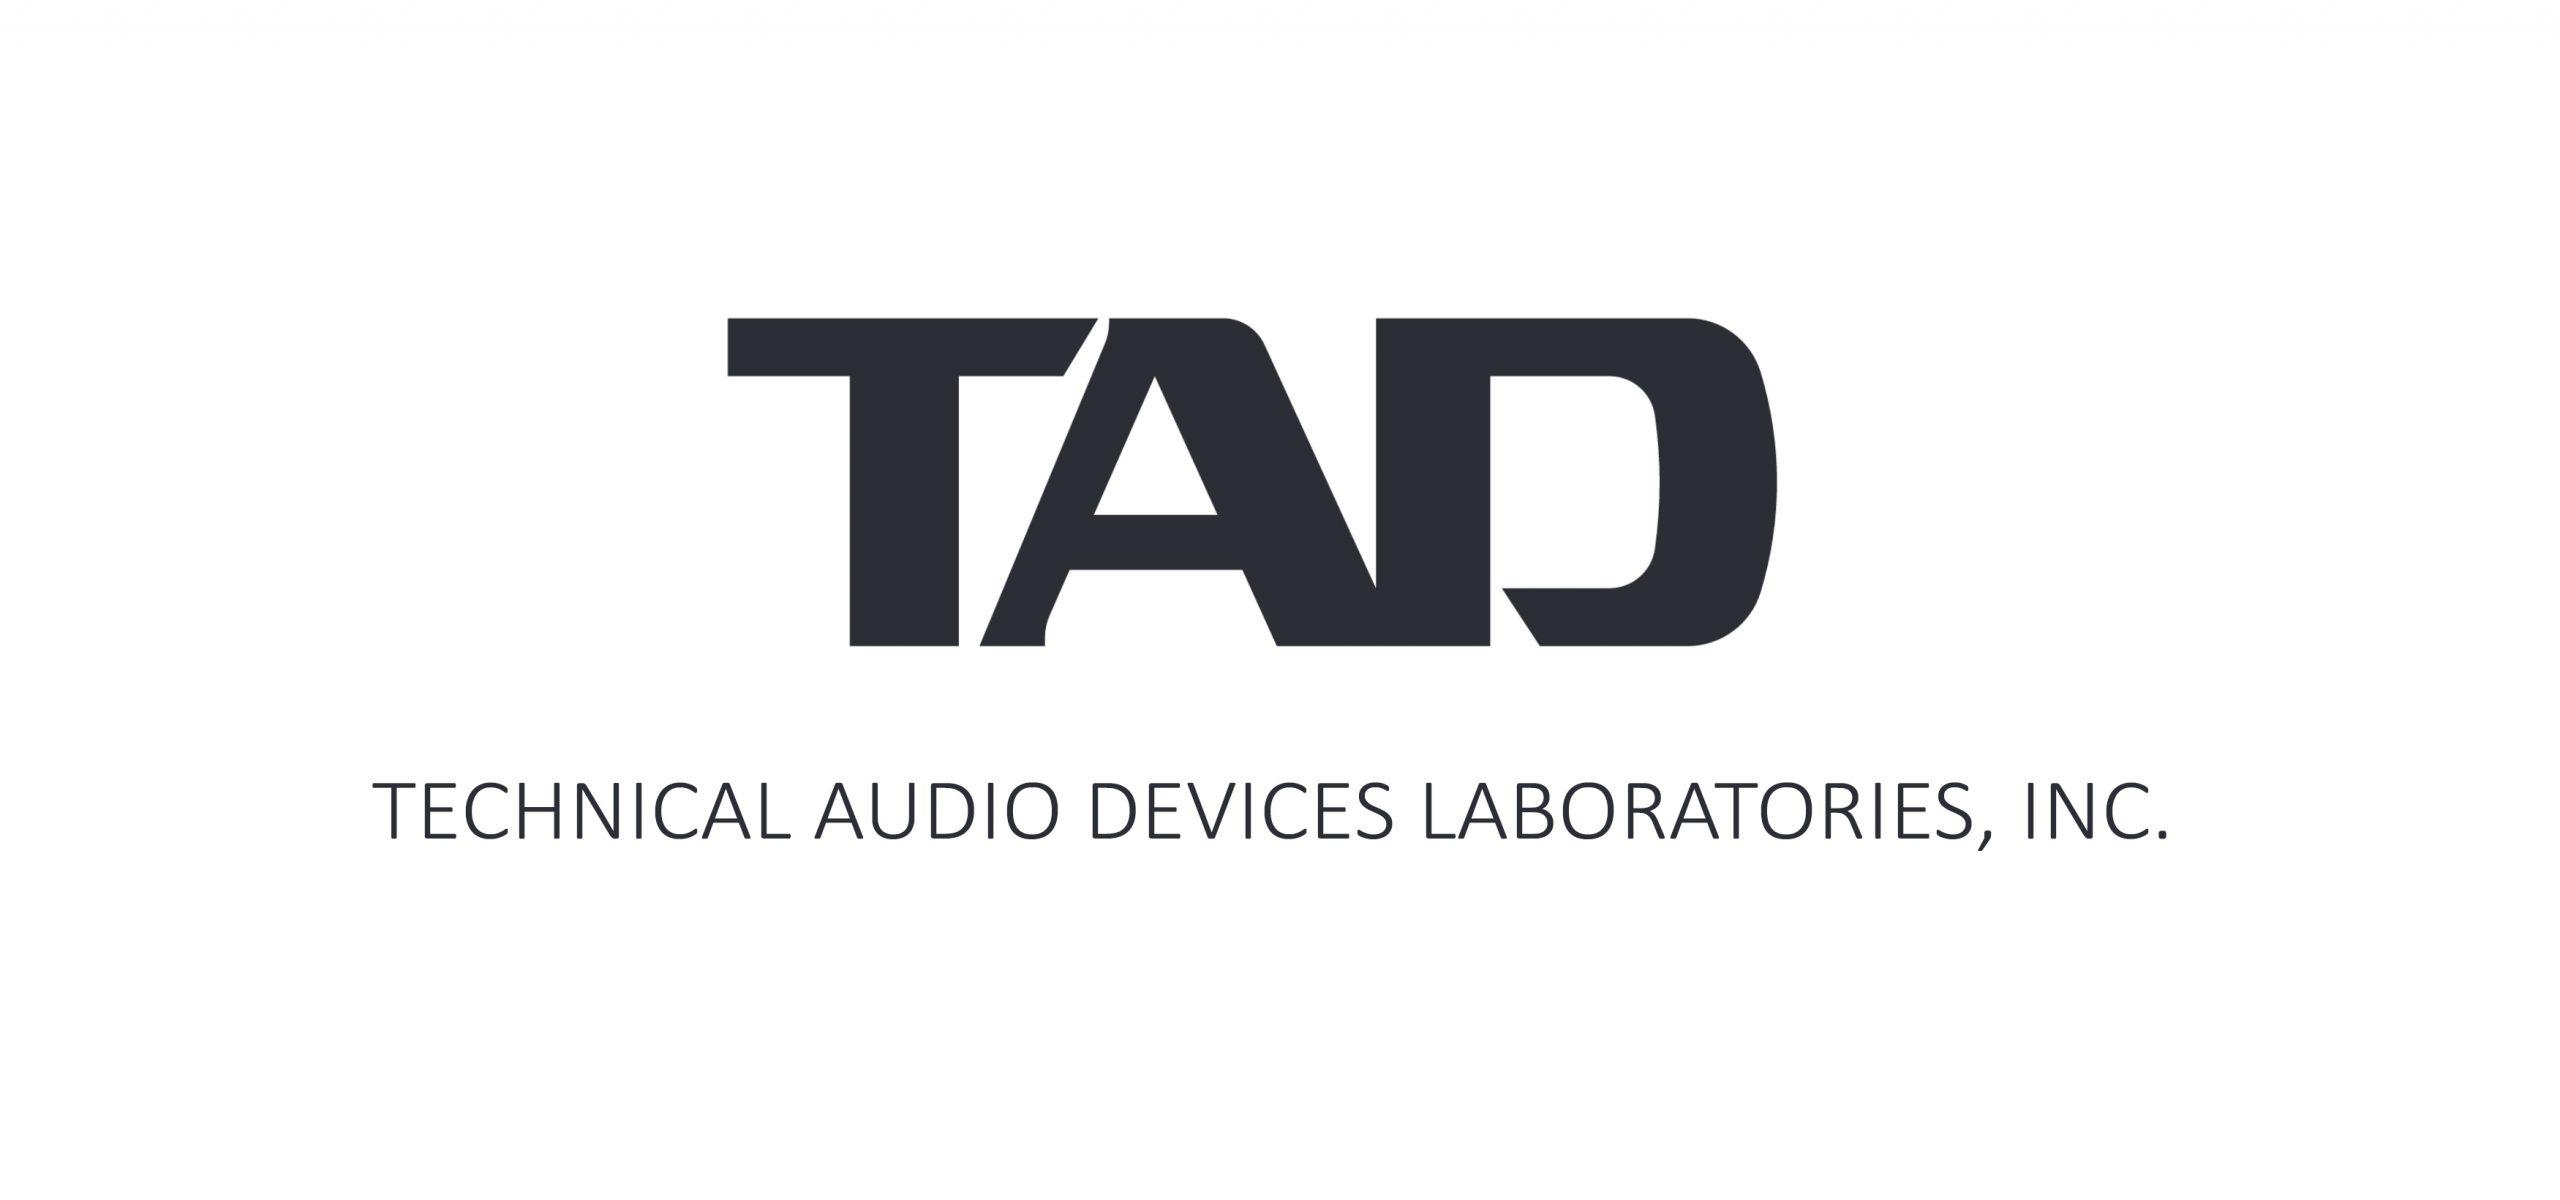 http://amiraudio.com/wp-content/uploads/2020/12/HADDS-1-scaled.jpg